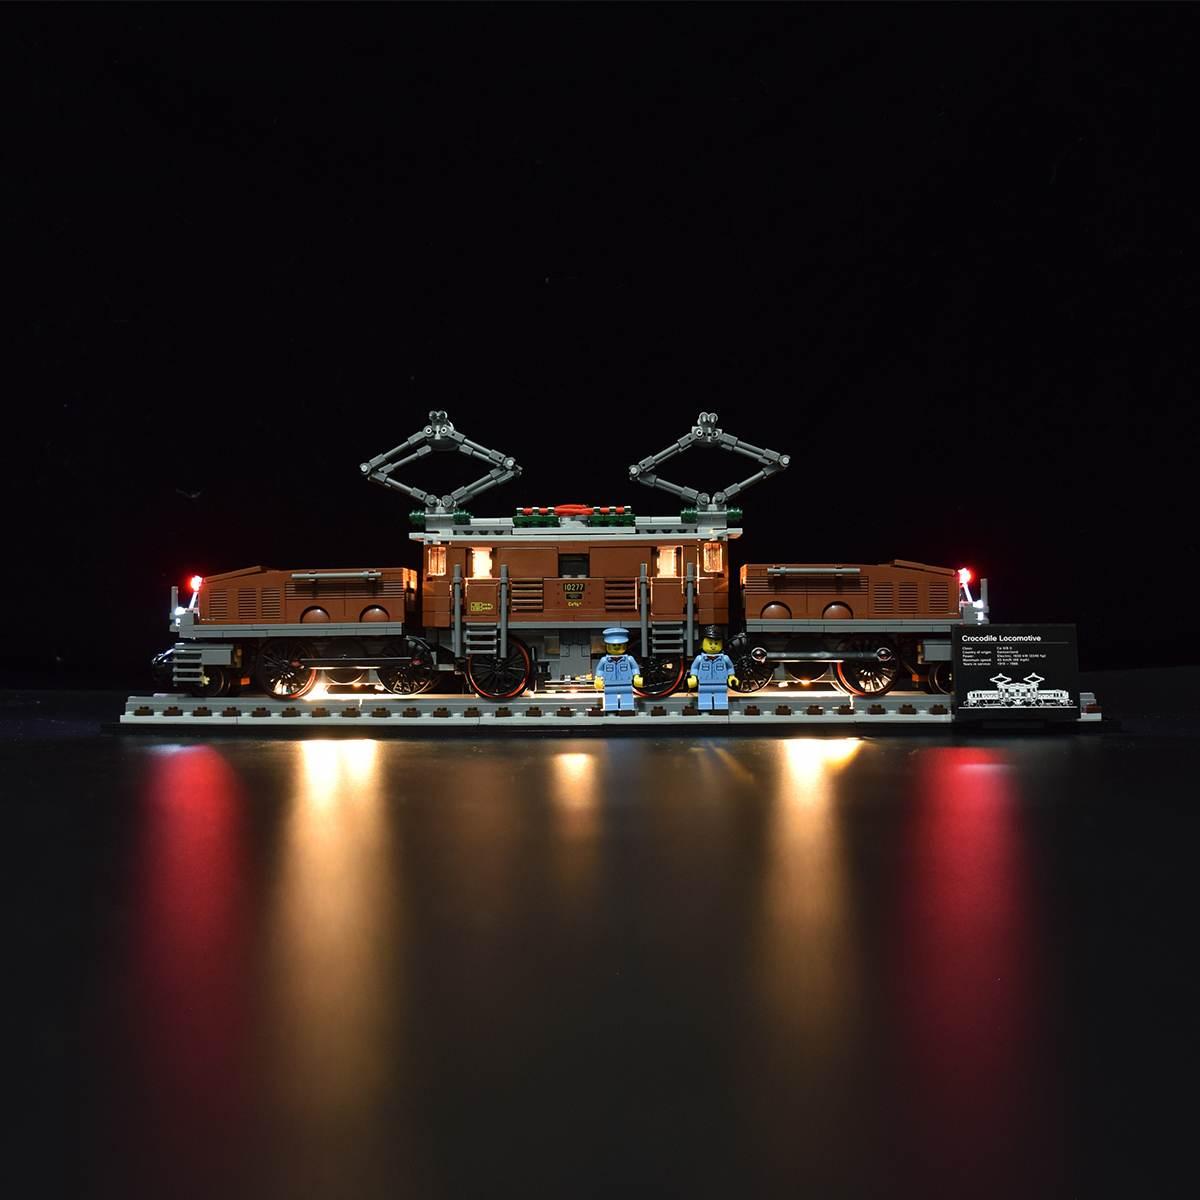 Light Kit For Crocodile Locomotive 10277